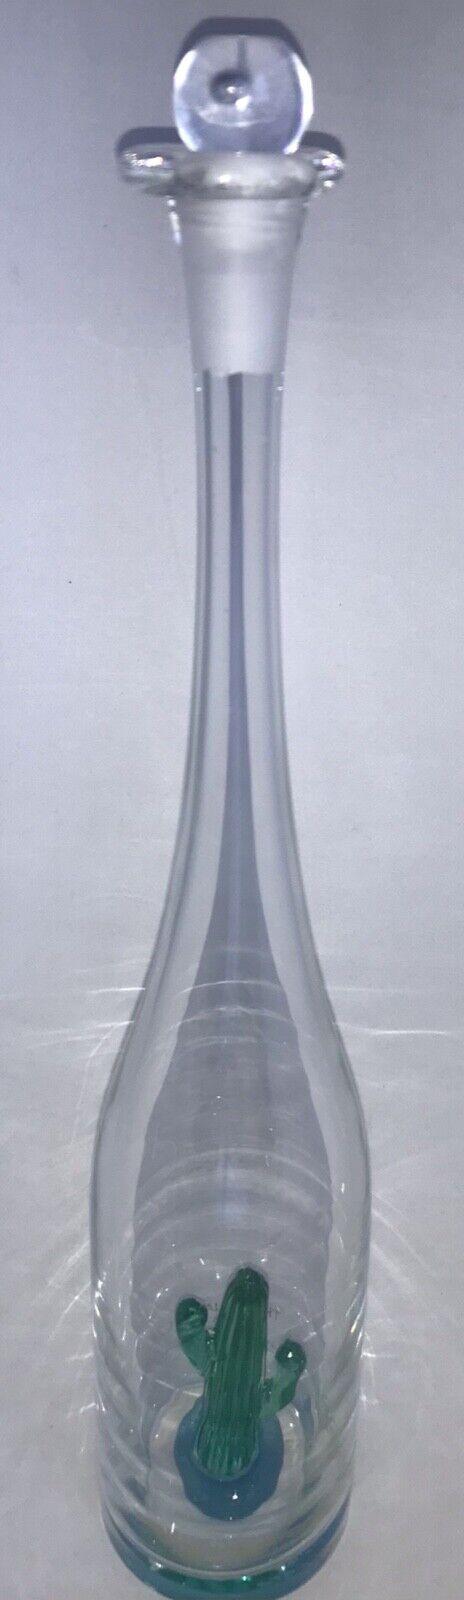 Tres Quatro Cinco Crystal Decanter Tequila bottle Limited 69/600 Alonso Gonzalez